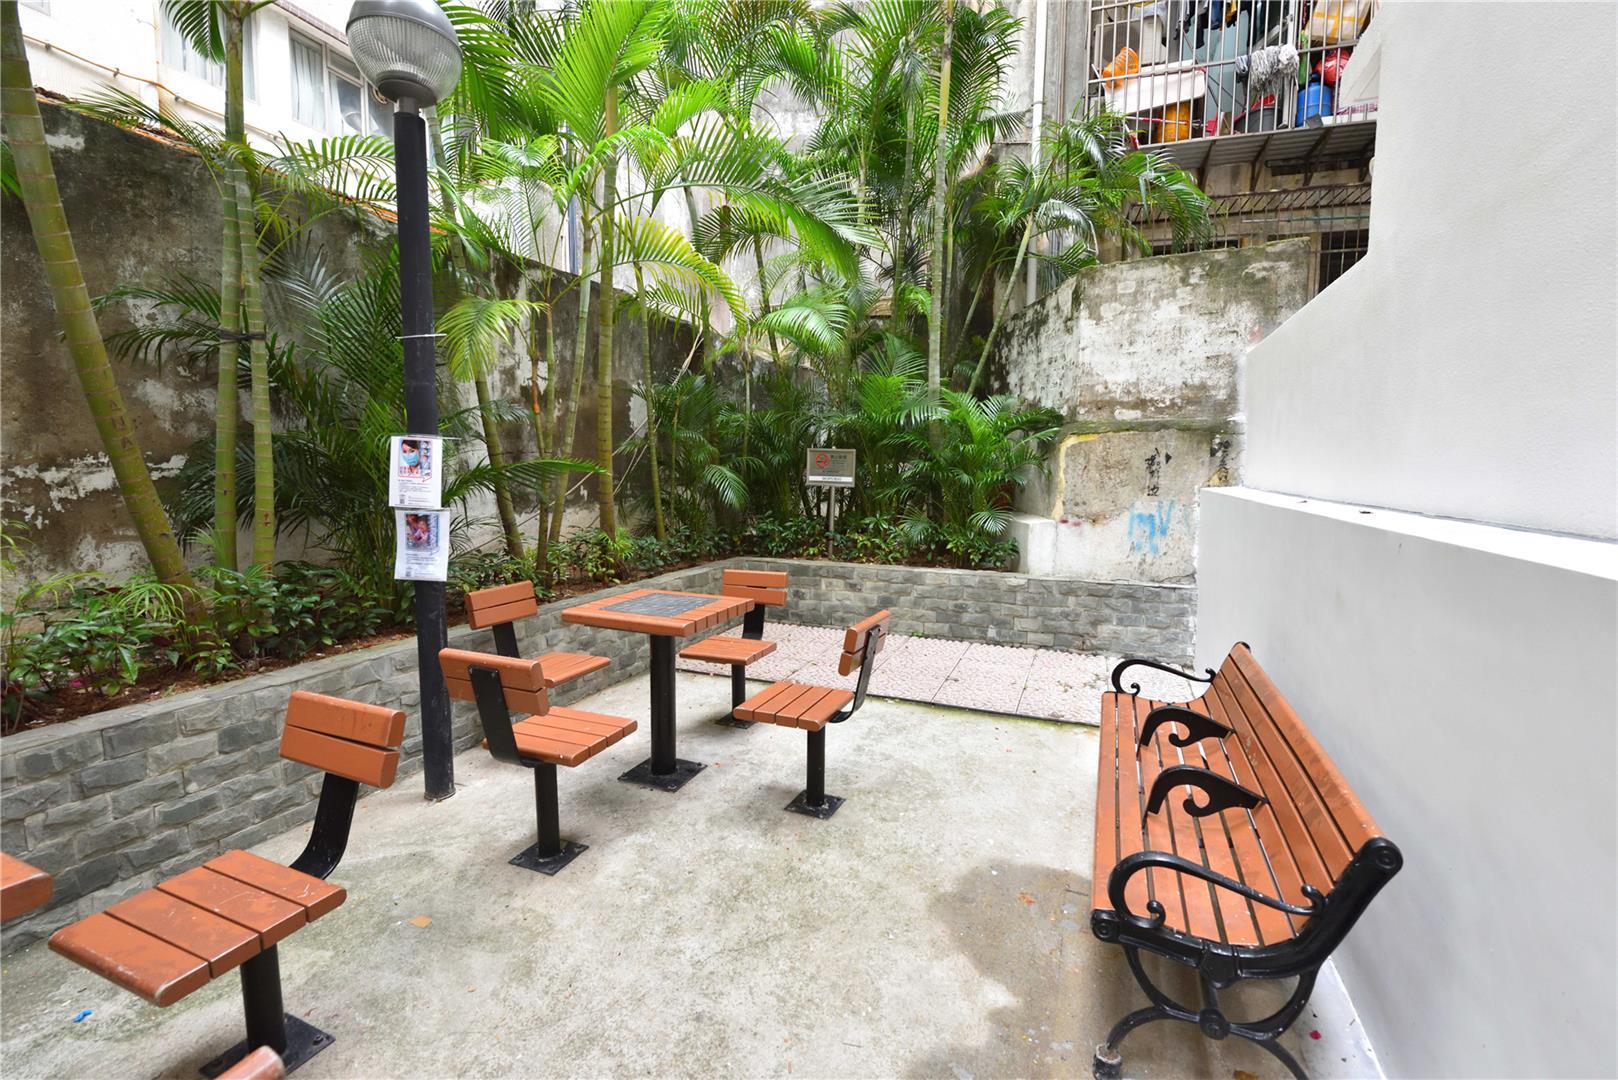 Temporary Leisure Area in Rua de Inácio Baptista